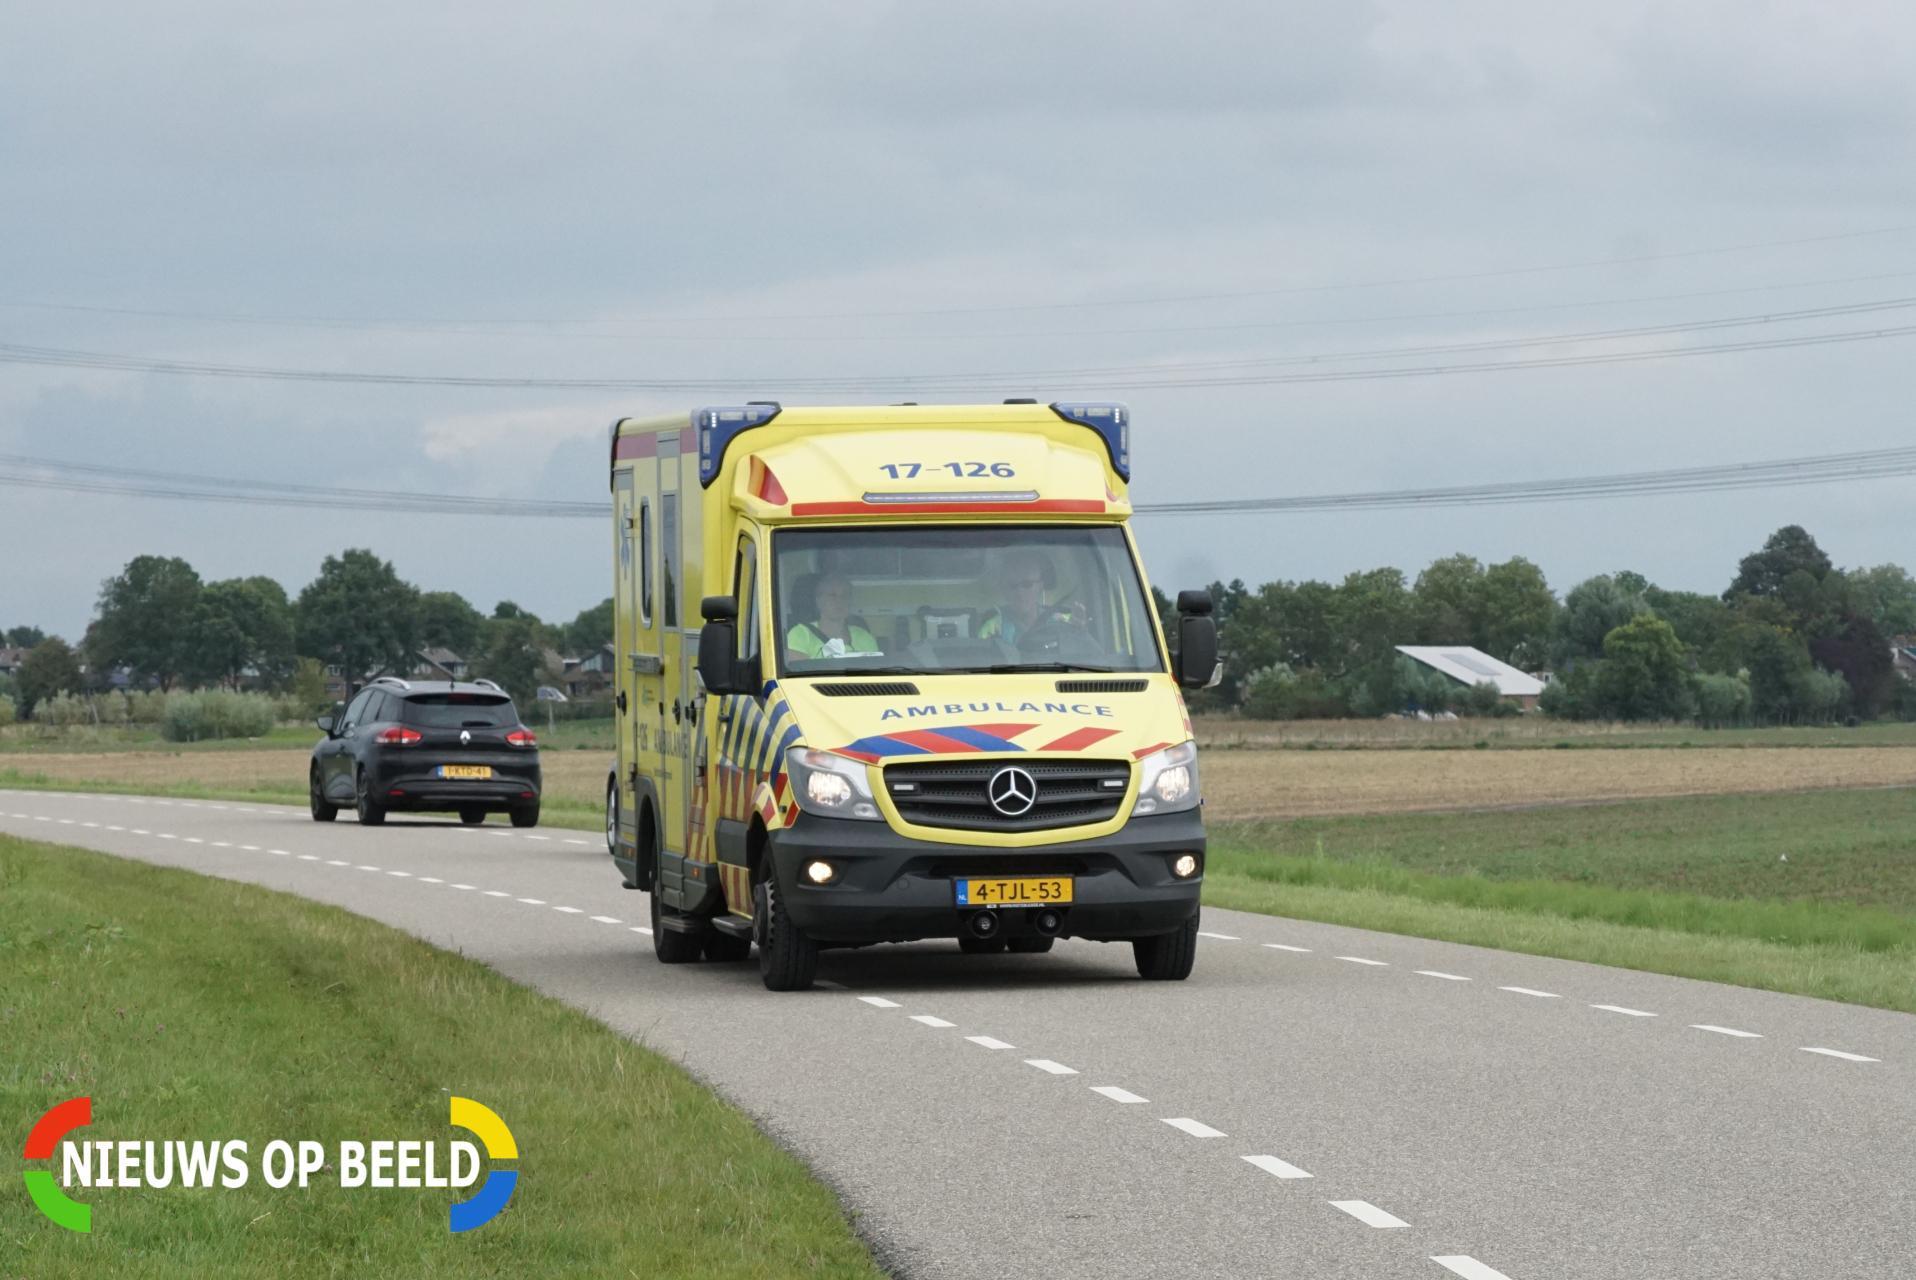 Persoon gewond na val in water Nely Gambonplein Zevenhuizen